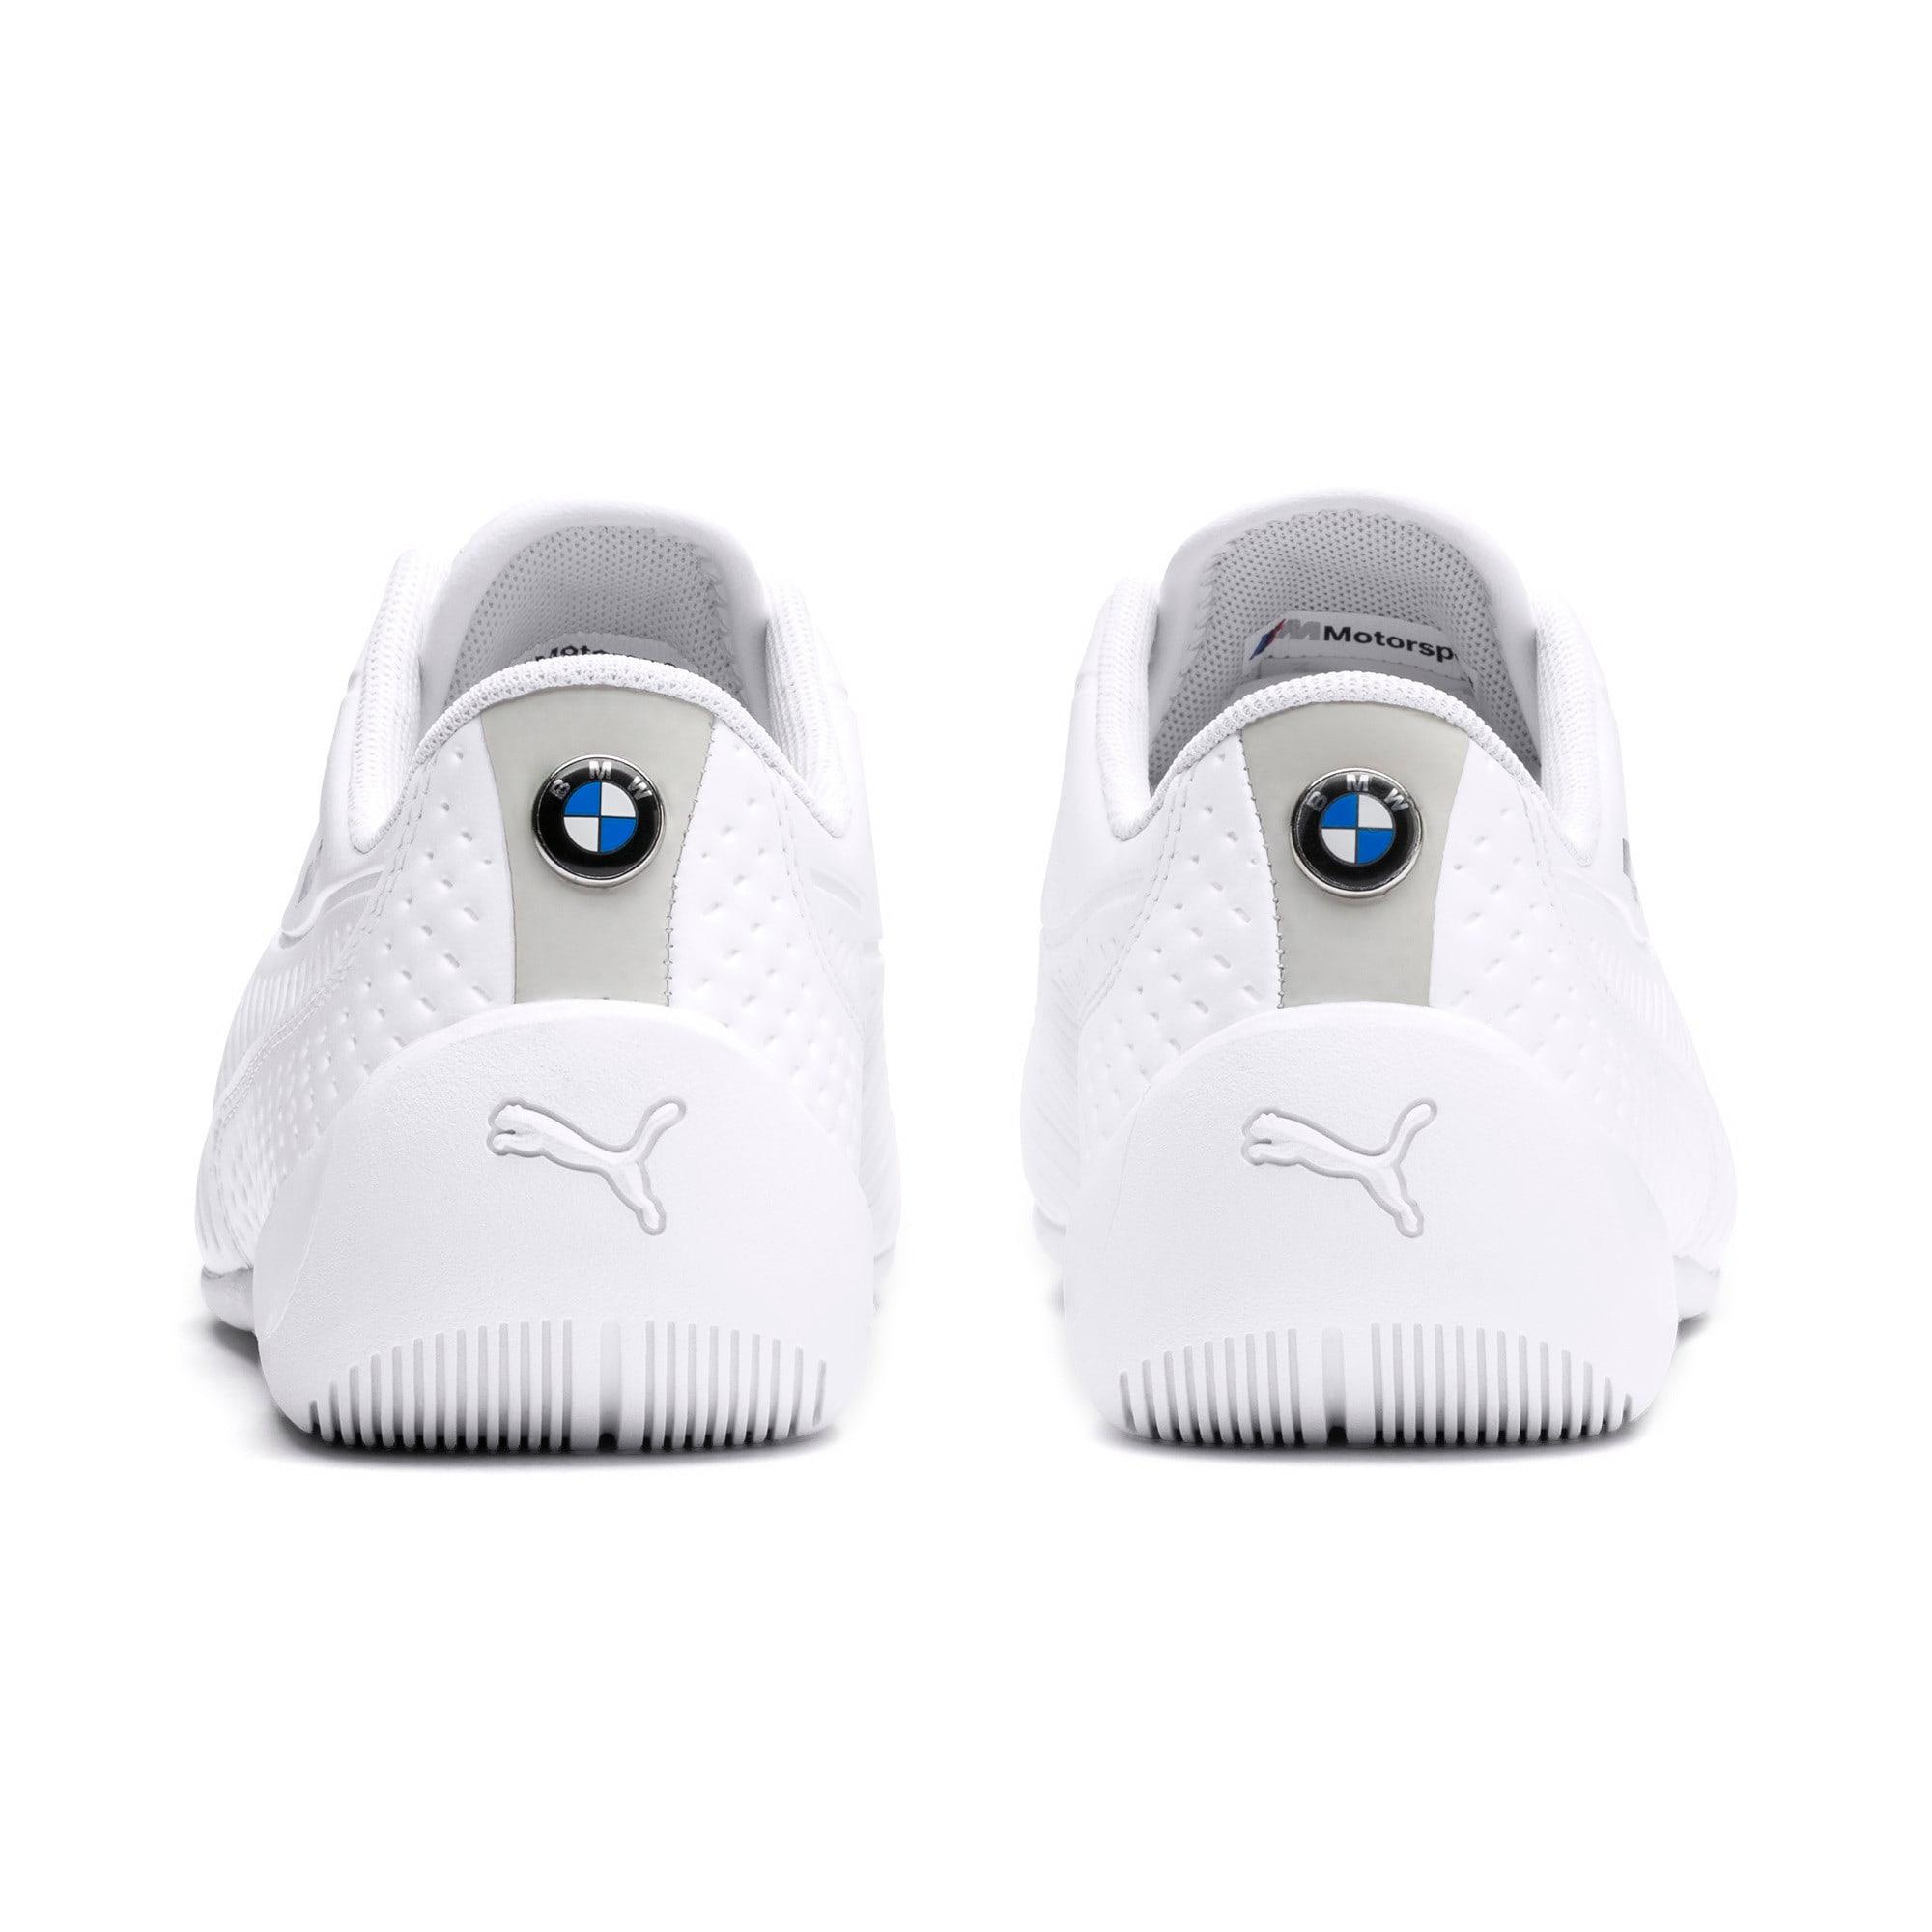 Thumbnail 3 of BMW M Motorsport Drift Cat 7S Ultra Youth sneakers, Puma White-Puma White, medium